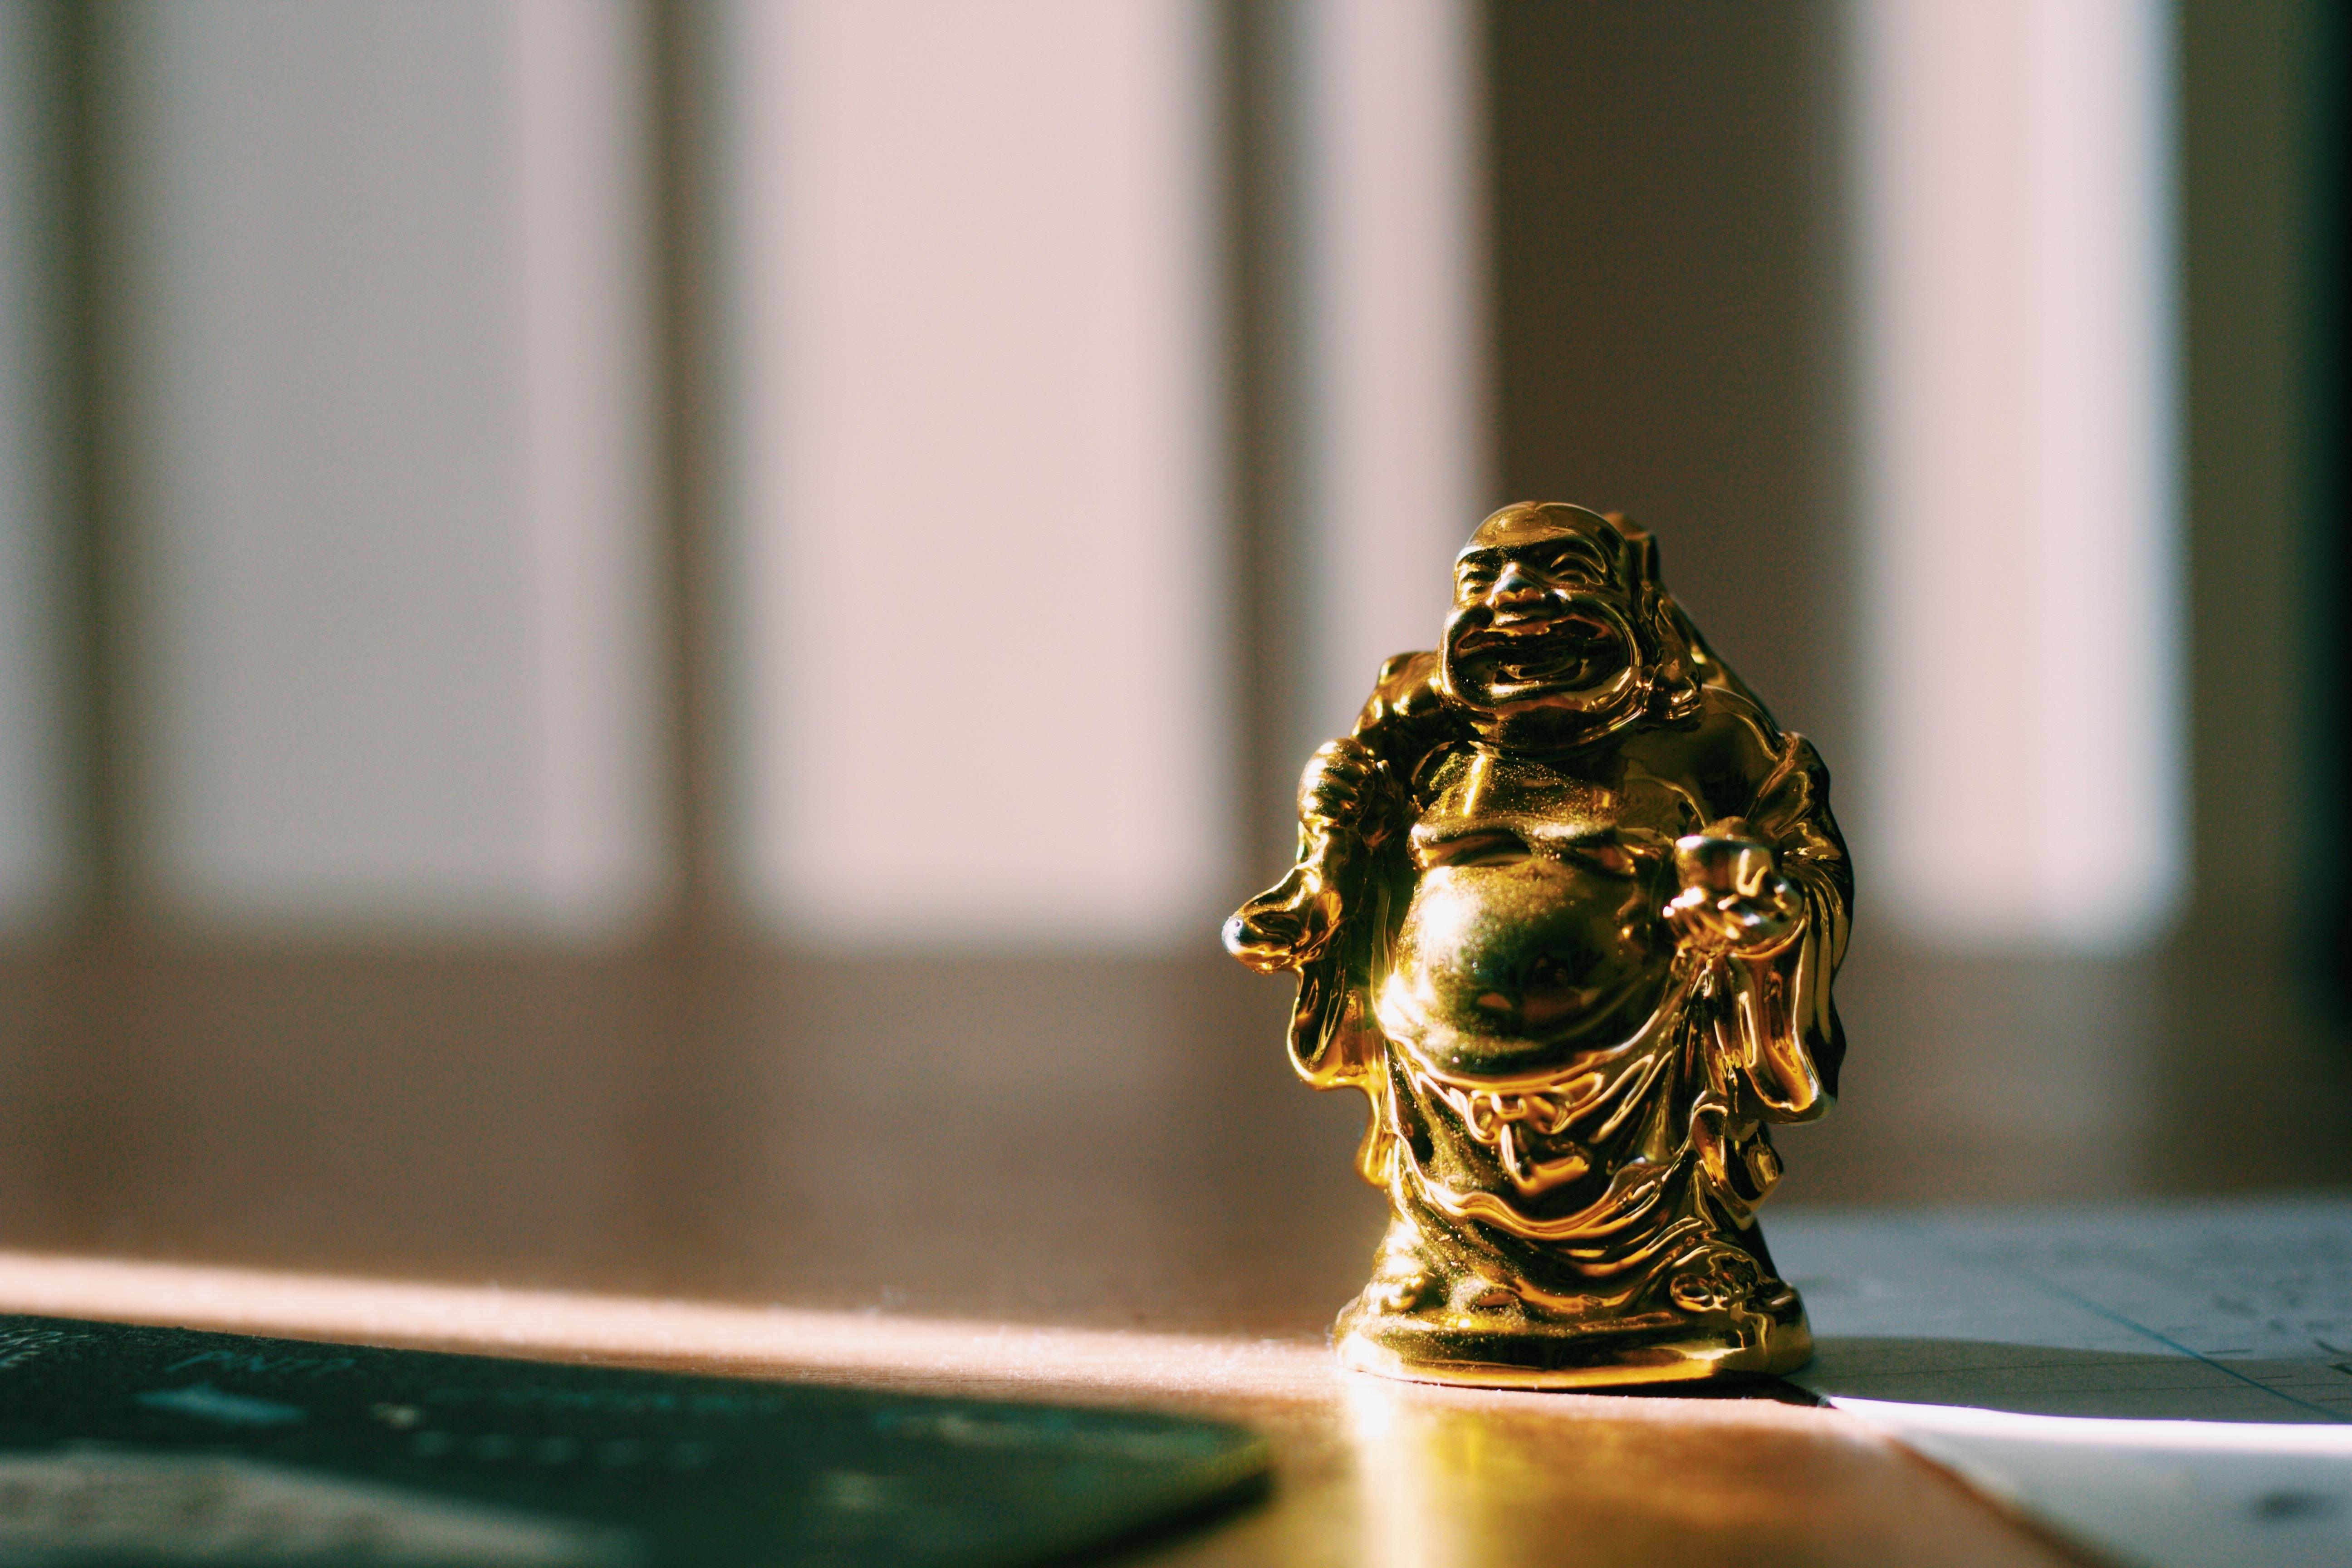 gold Buddha figurine on floor